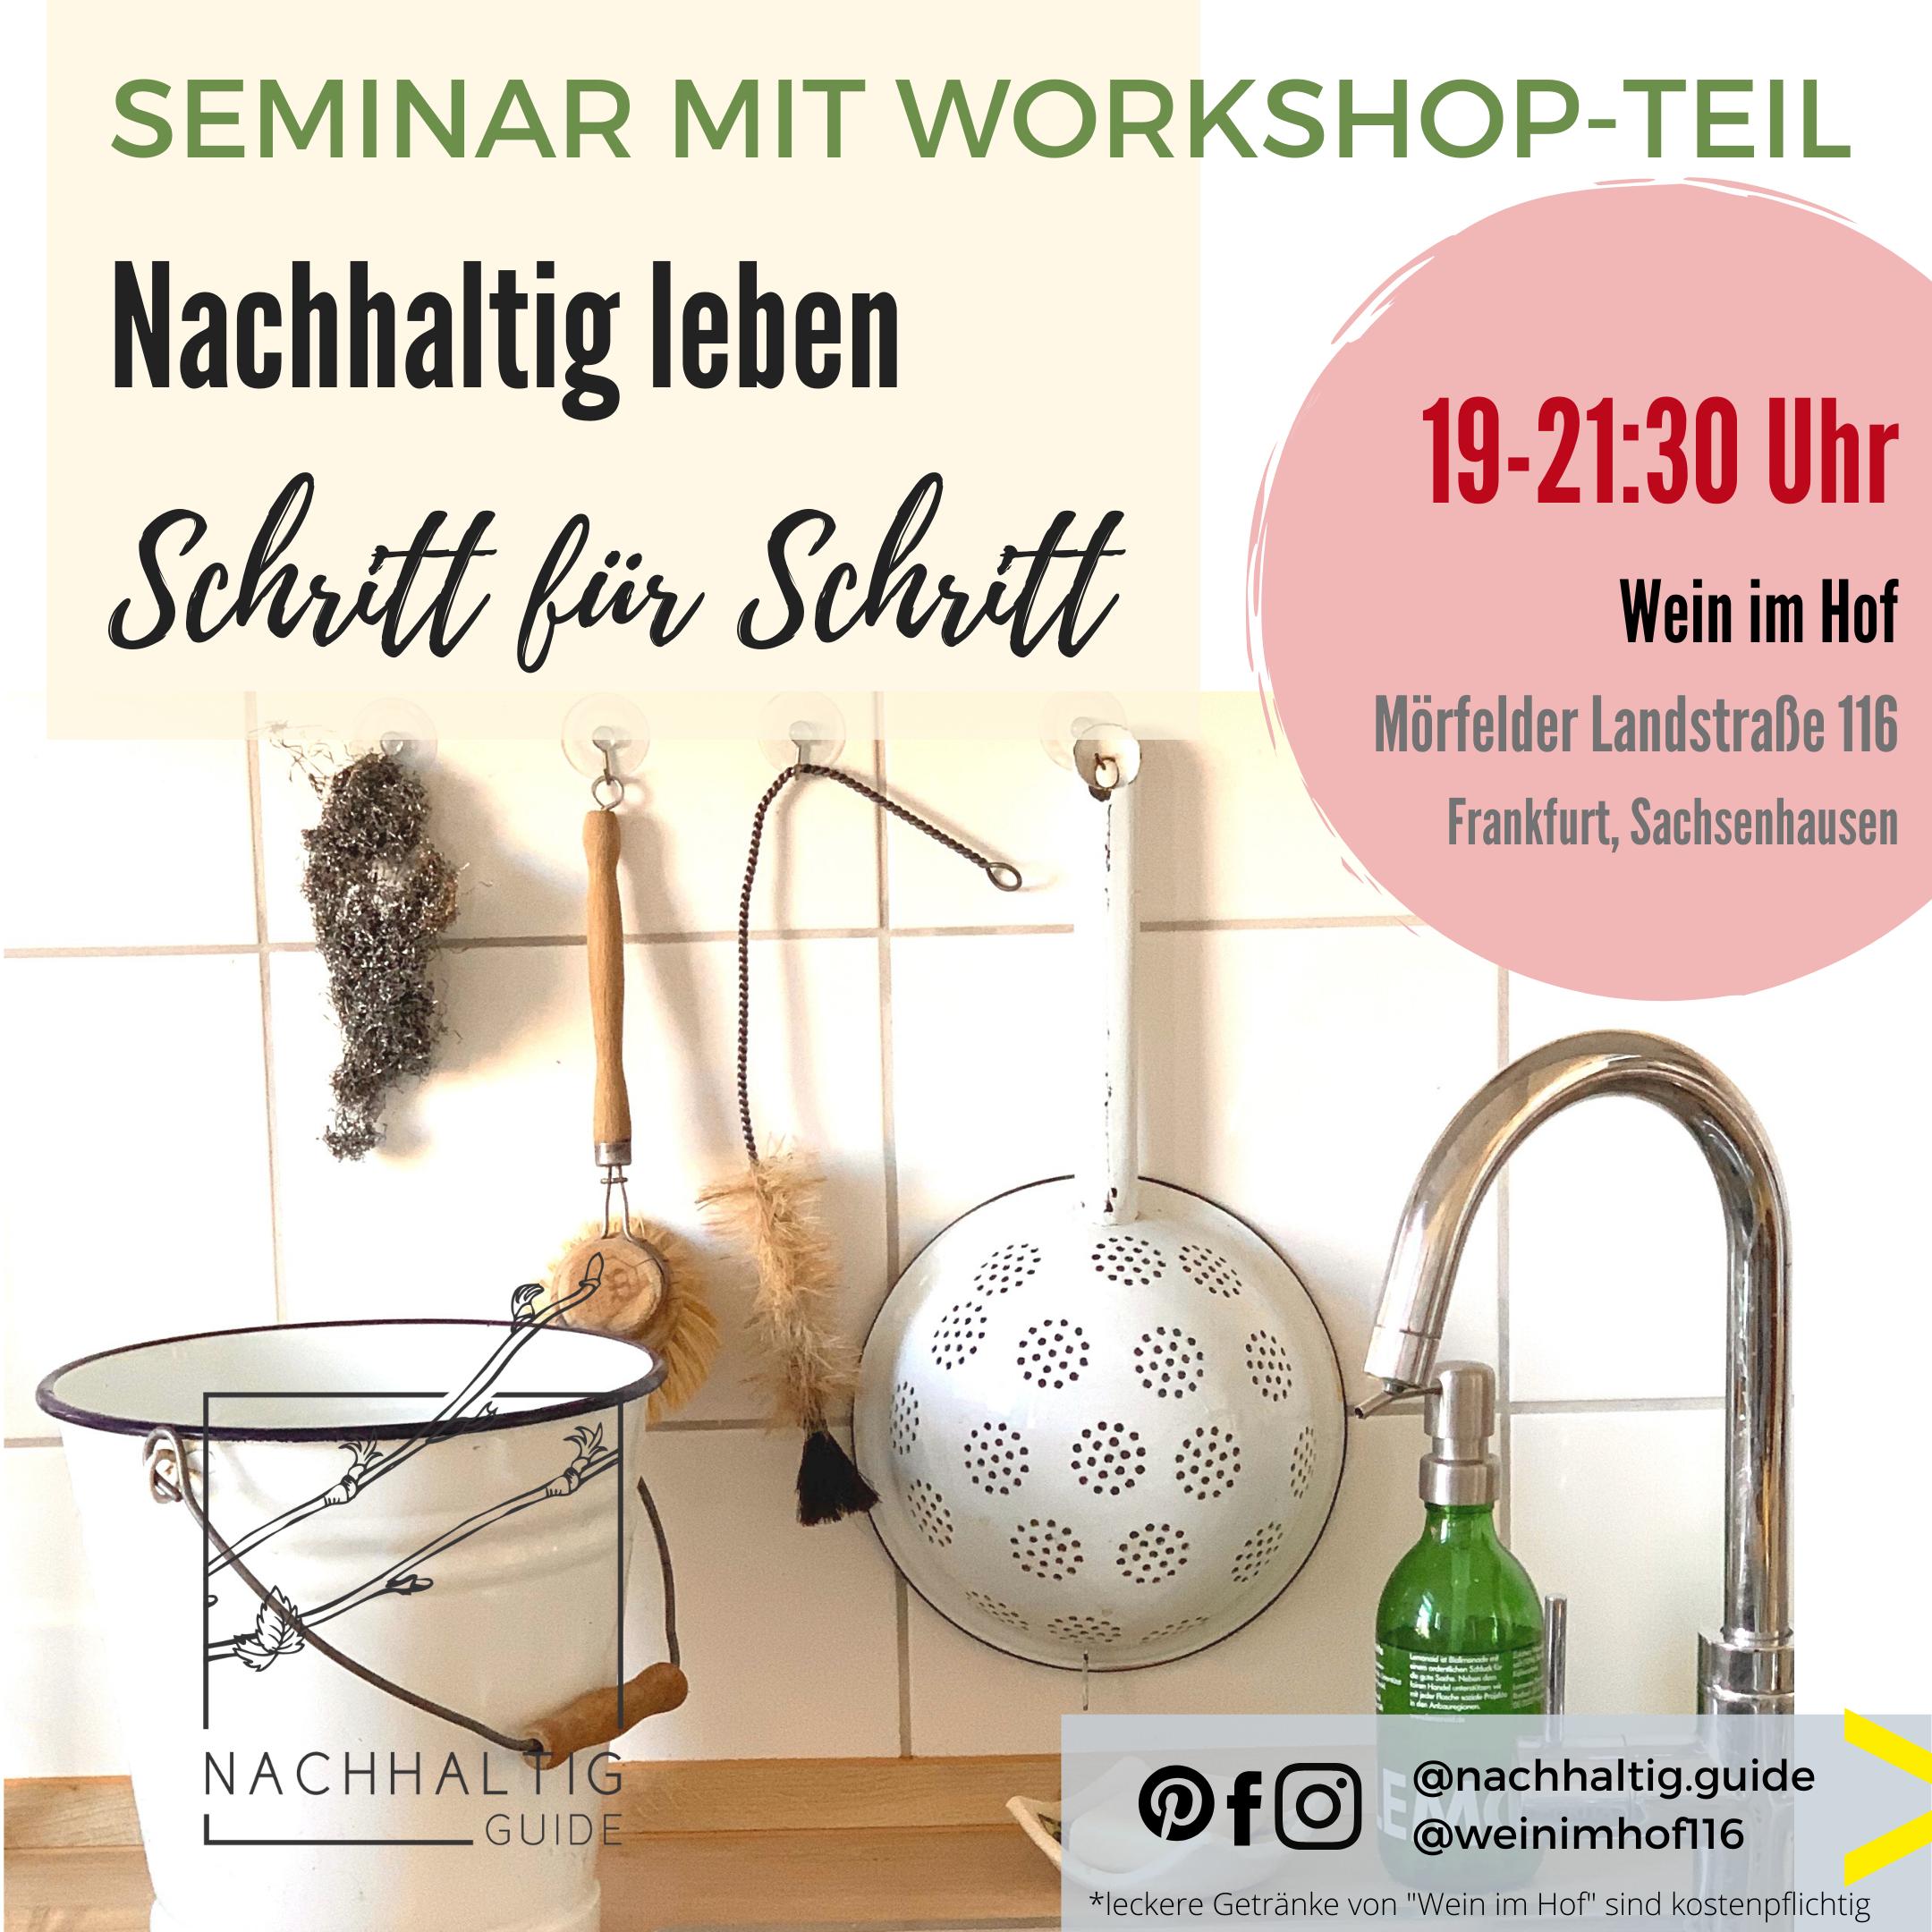 Nachhaltig leben – Starter Workshops in Frankfurt